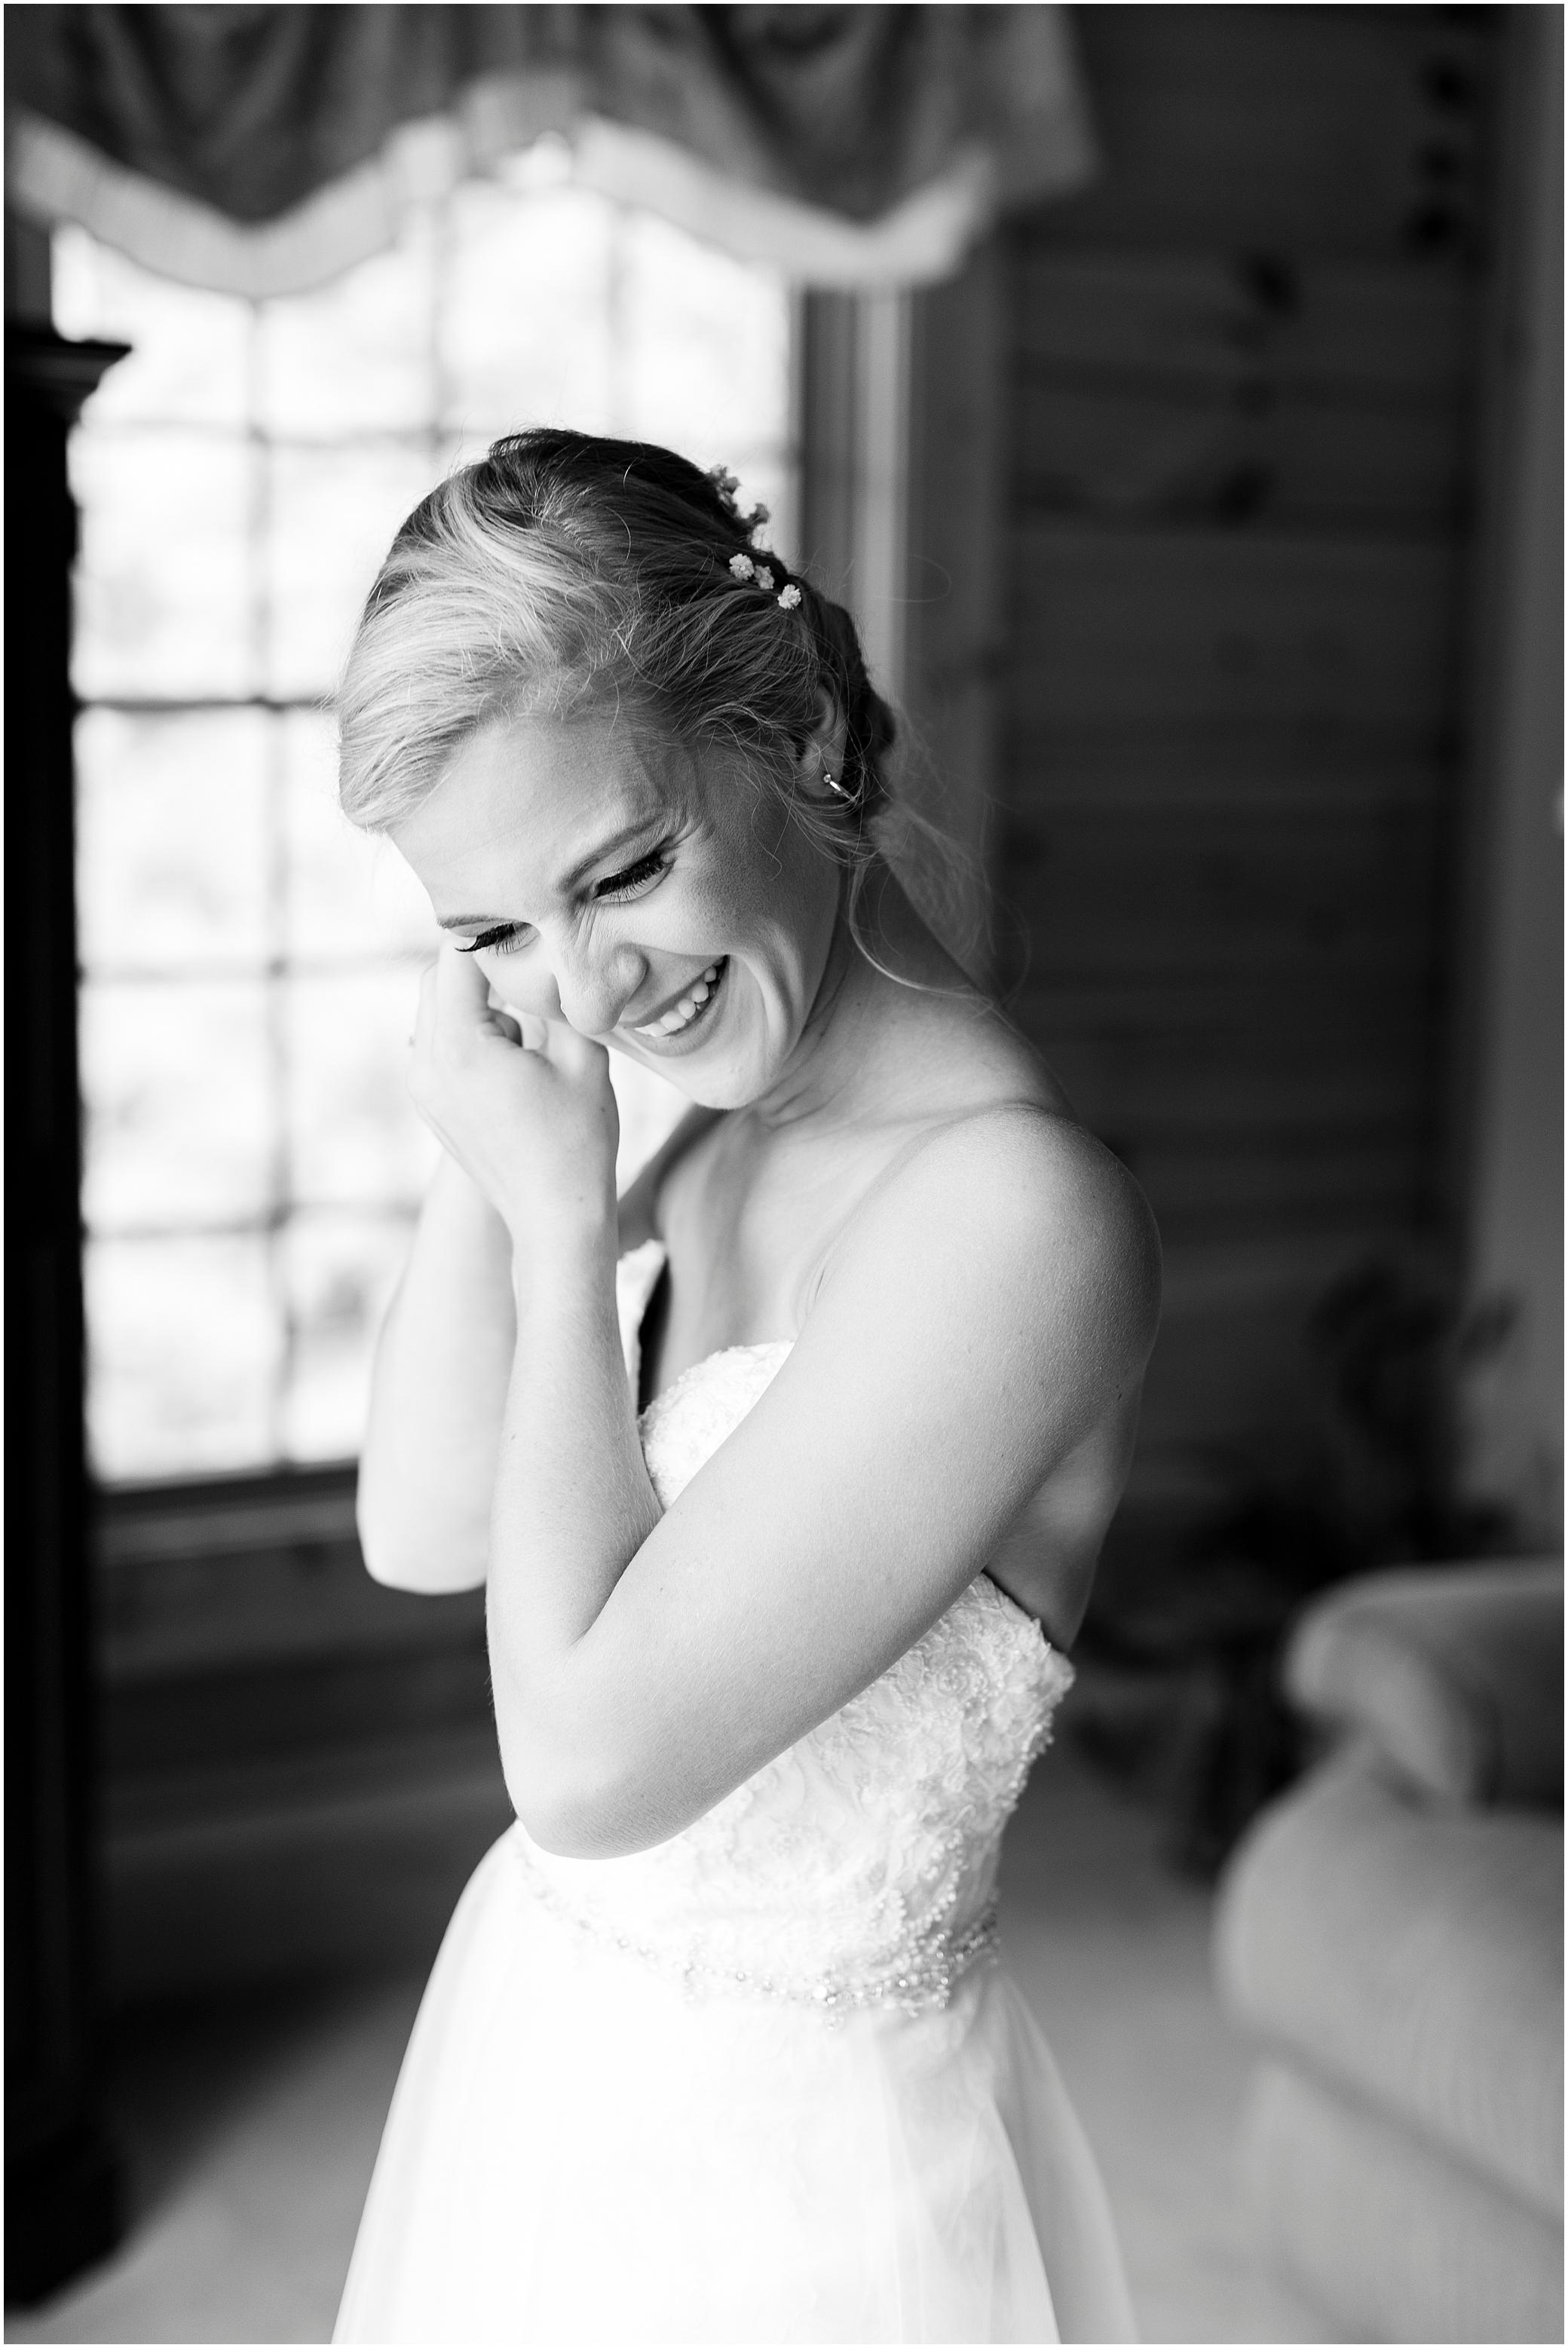 House Mountain Inn Wedding, Virginia wedding in the mountains, bride getting ready